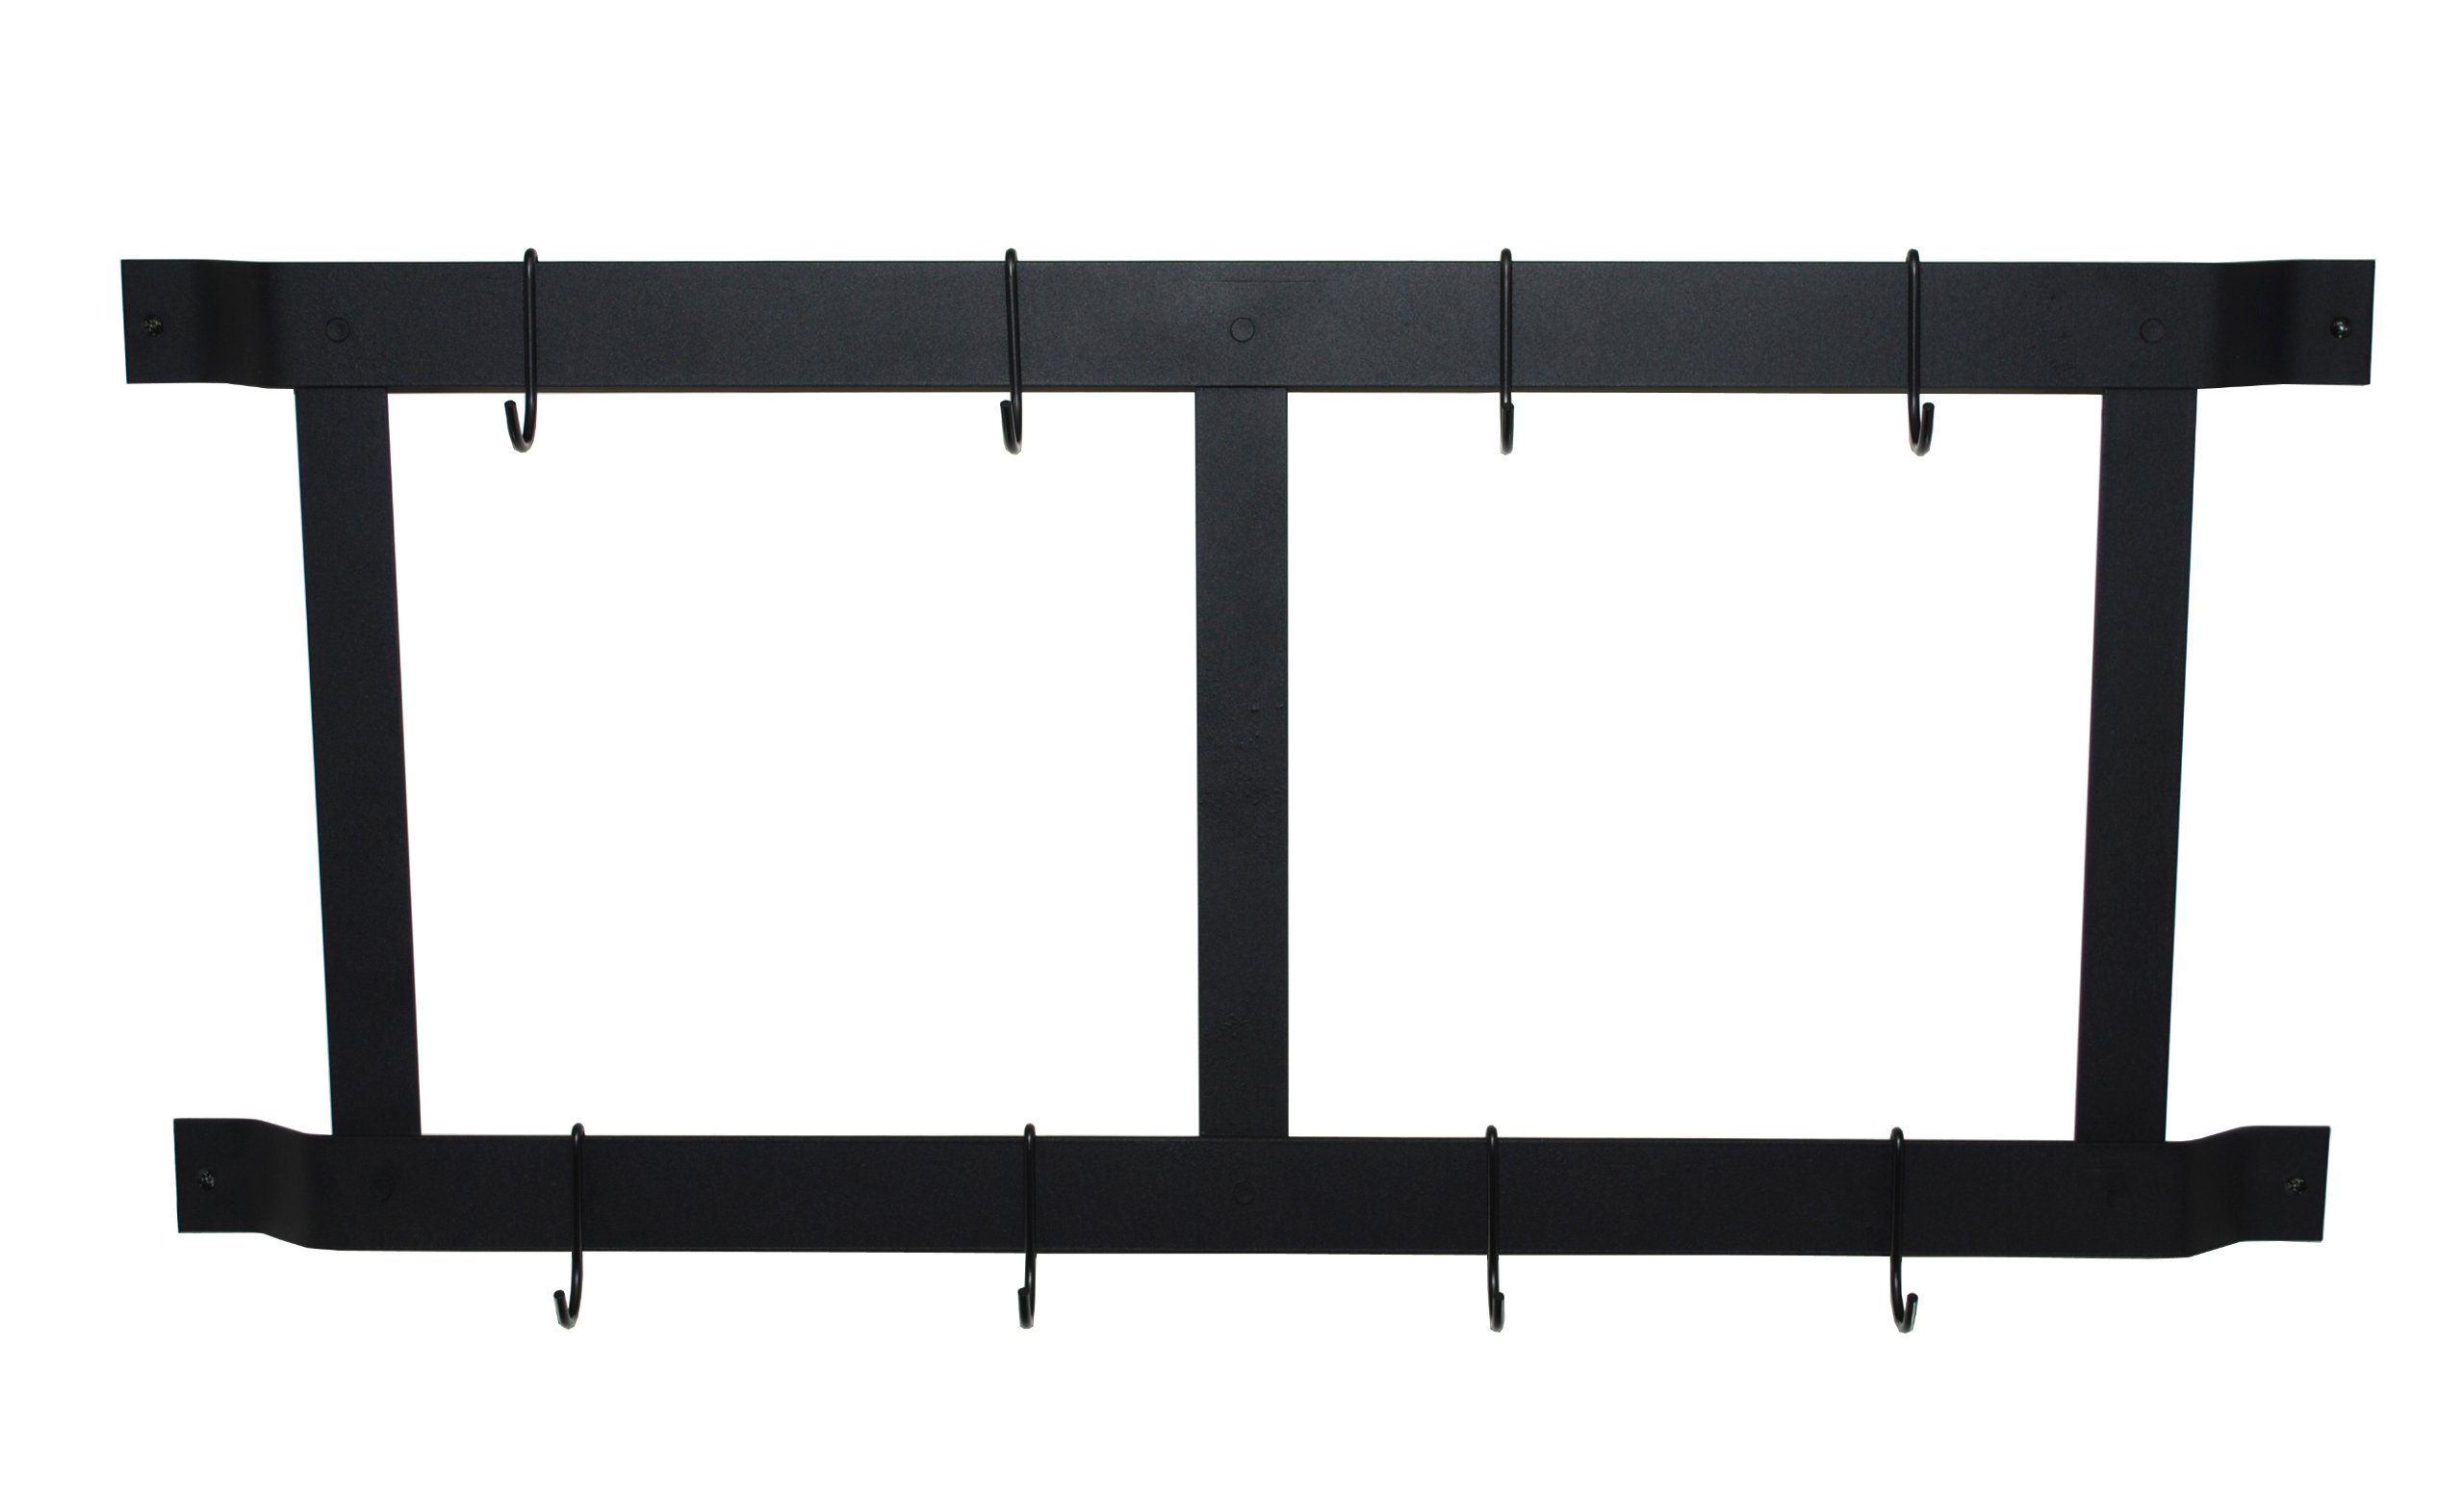 Rogar Ultimate Wall Mounted Pot Rack Vertical/Horizontal in Black